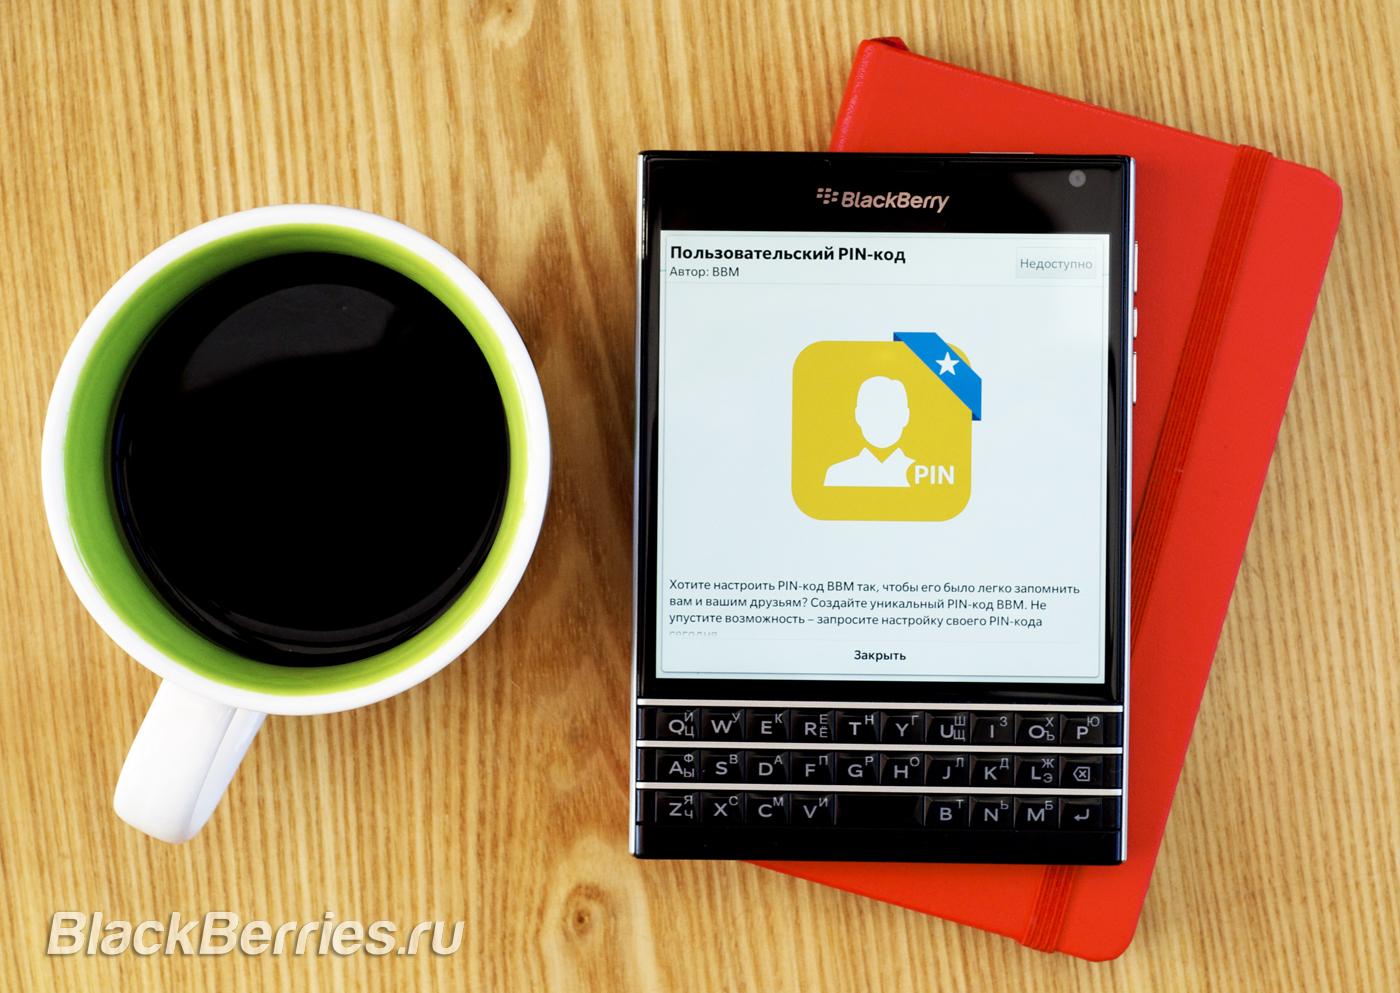 BlackBerry-Passport-BBM